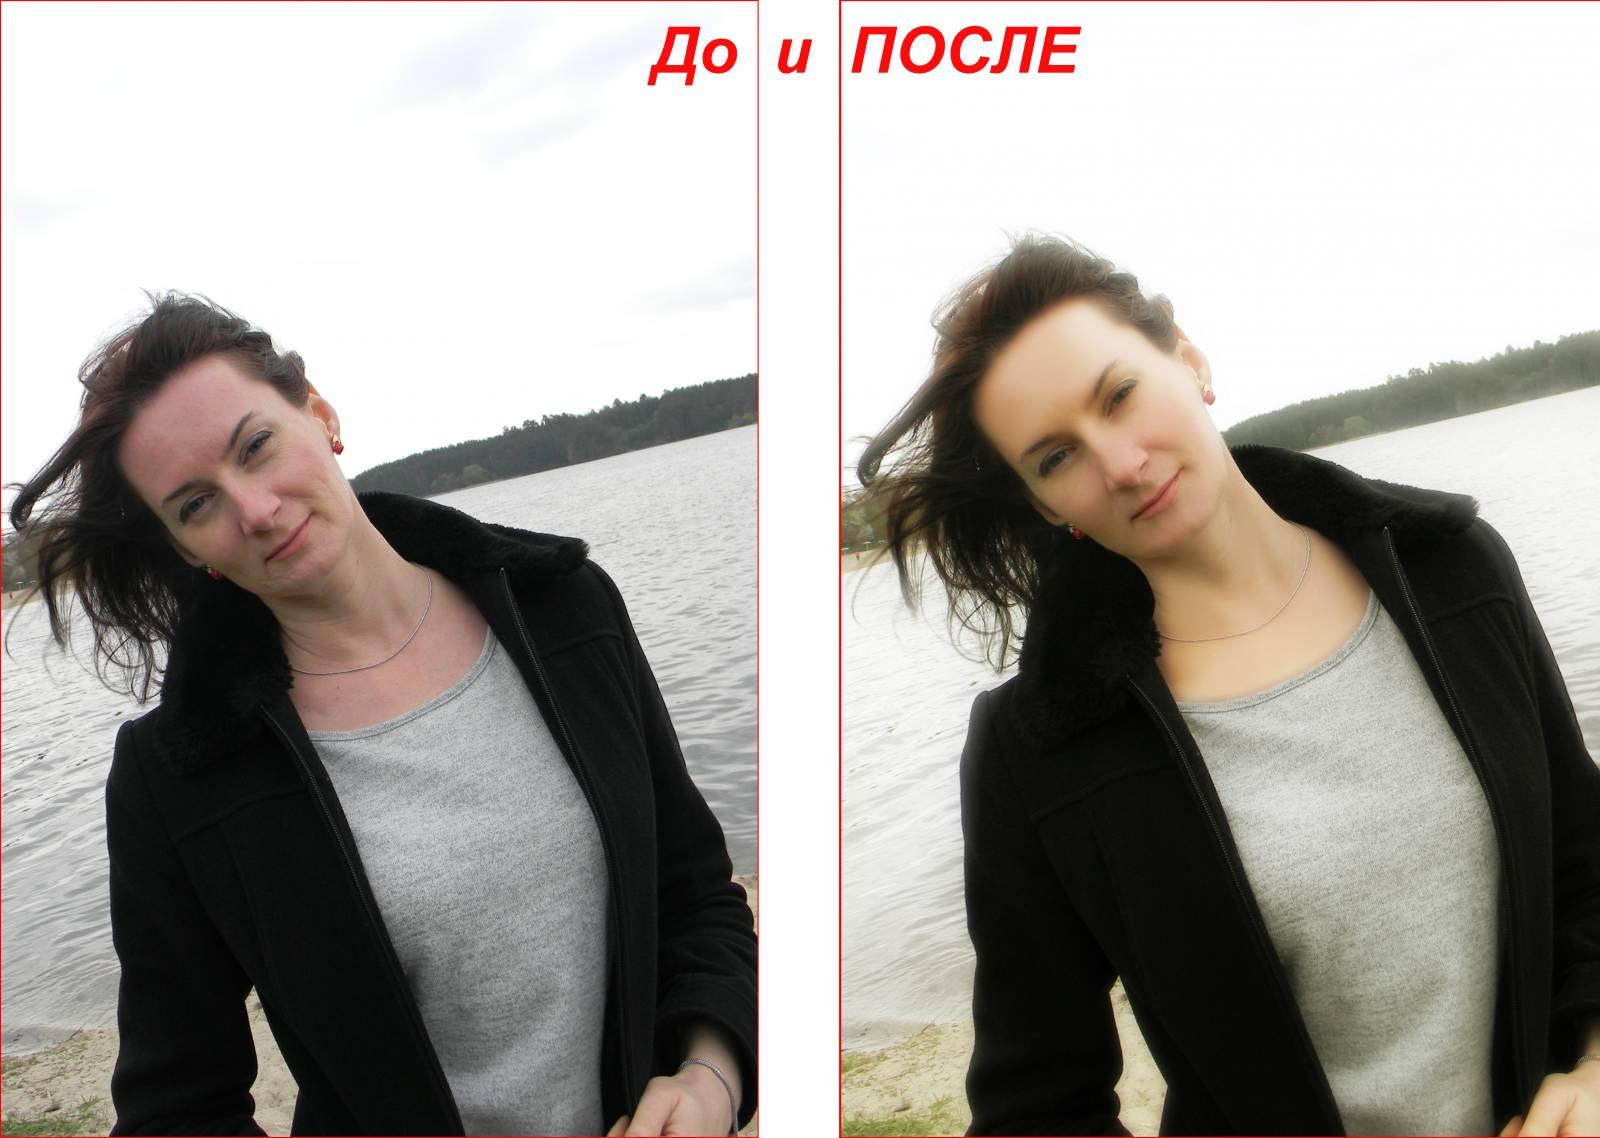 ретушь, стилизация фото